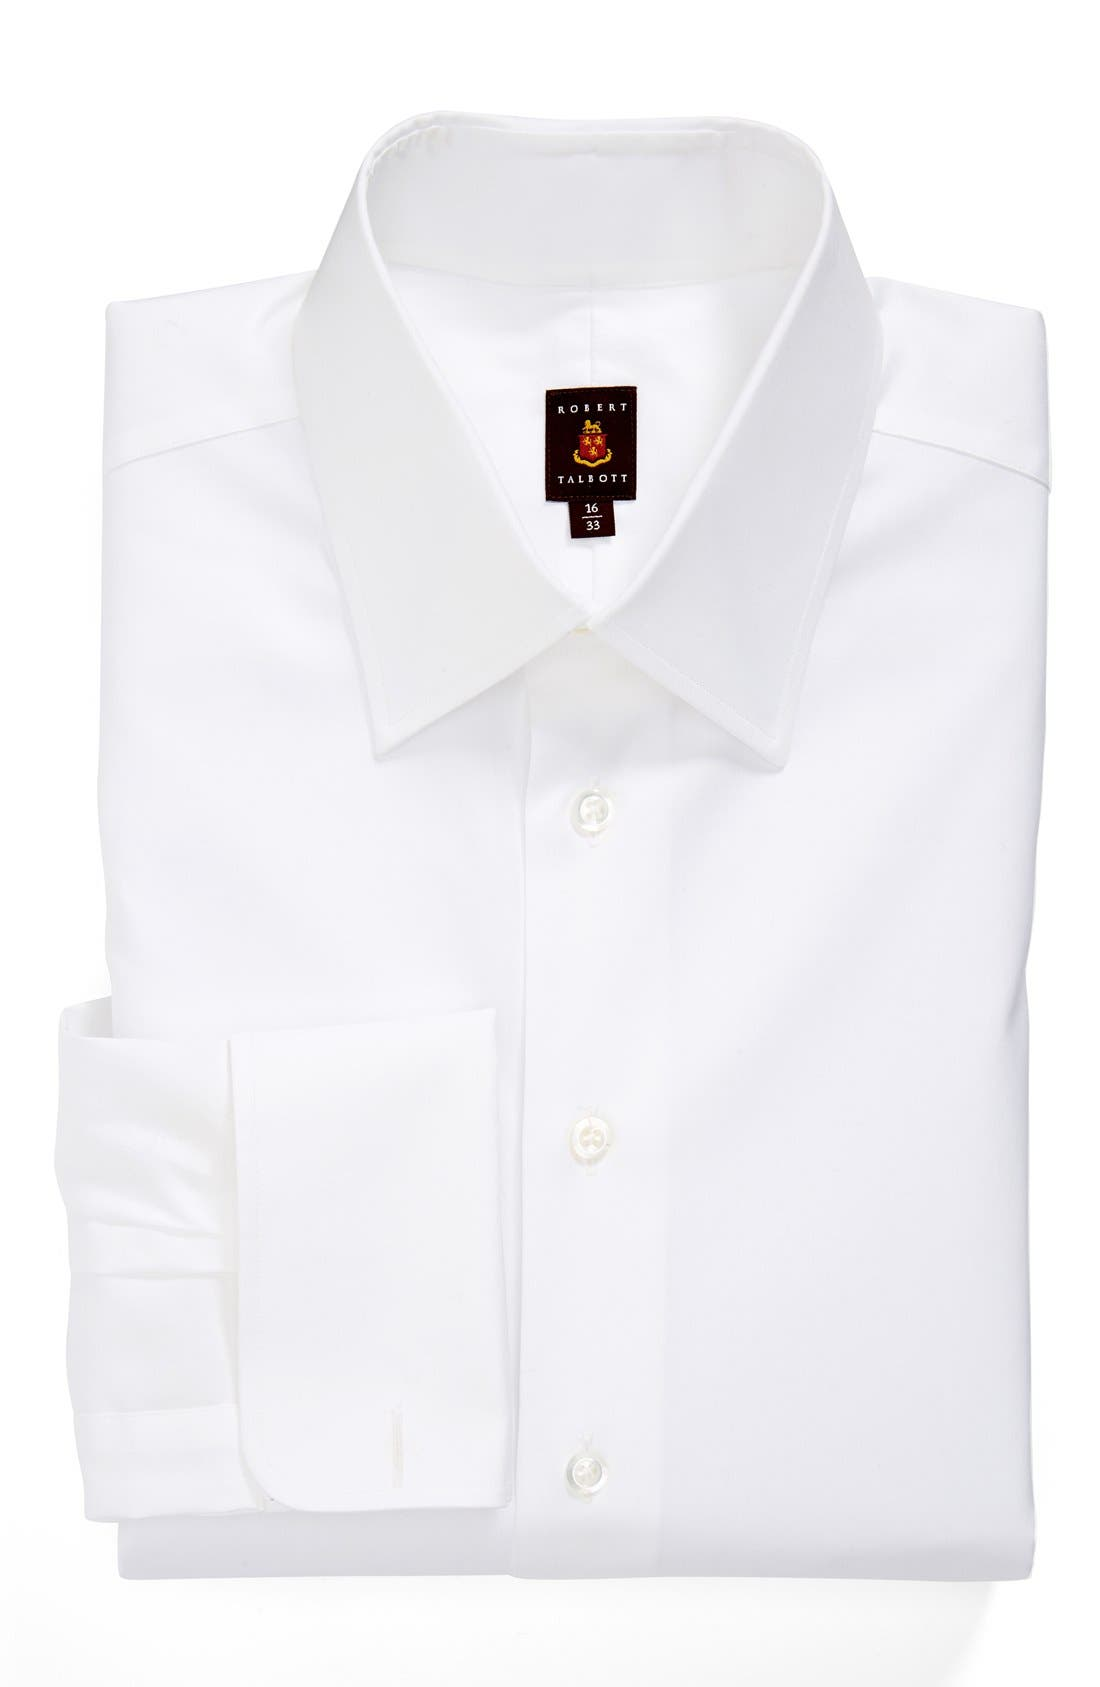 Alternate Image 1 Selected - Robert Talbott Classic Fit Solid Dress Shirt